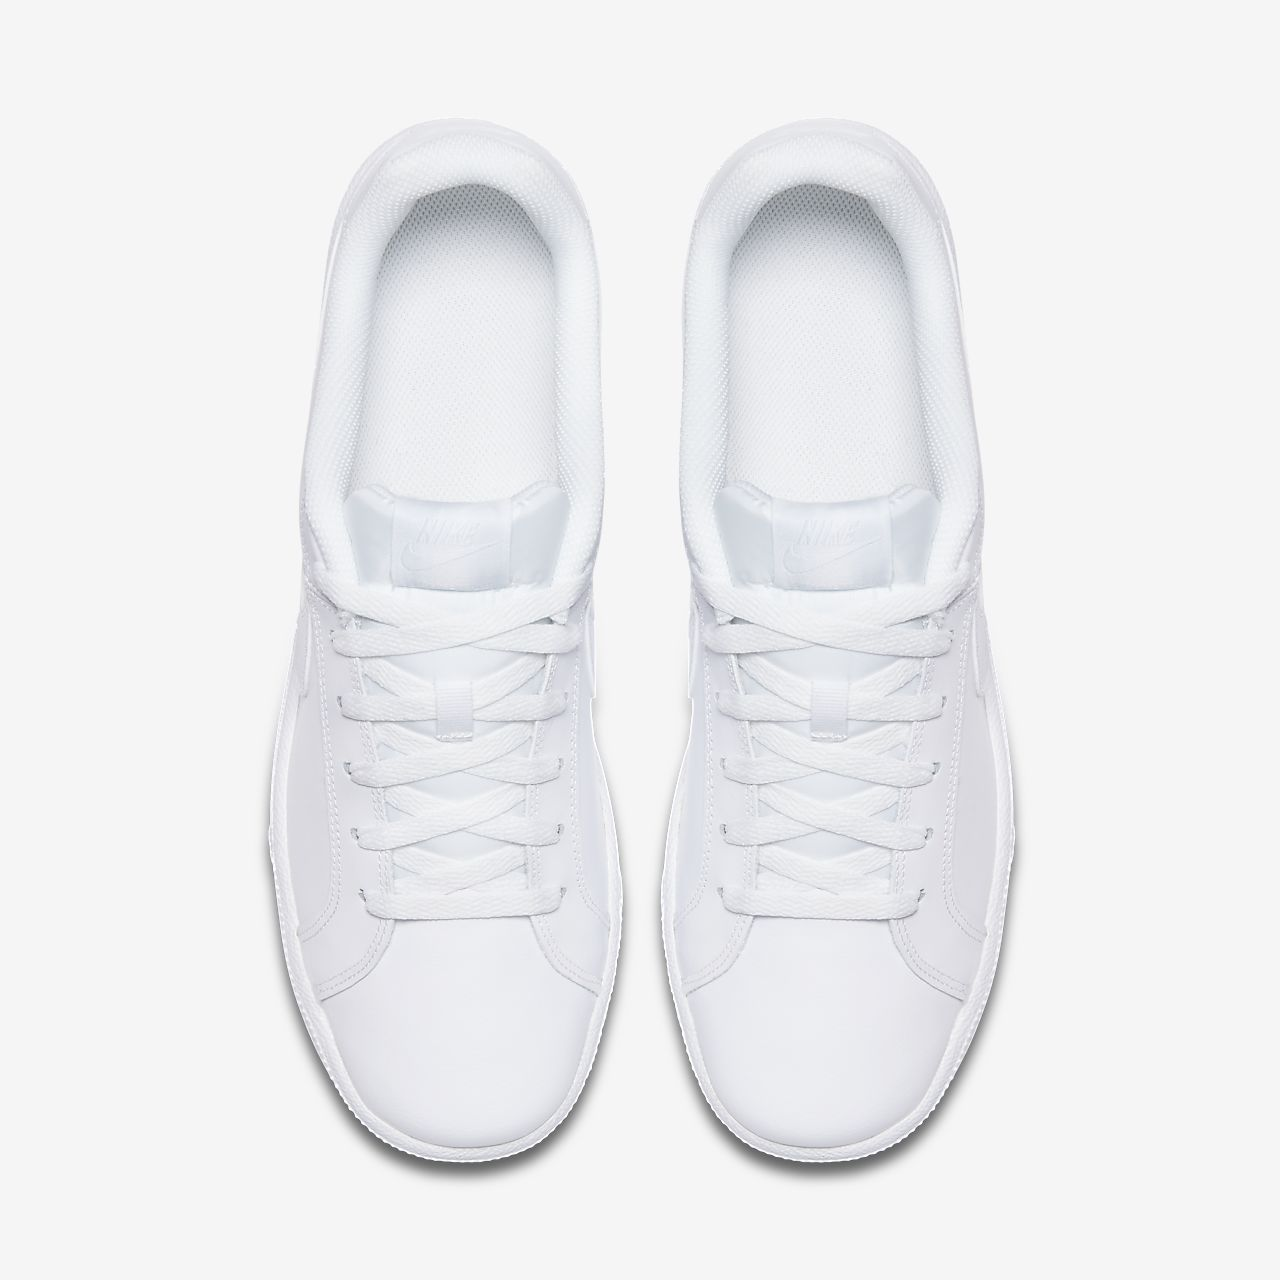 6c74d84d2 Sapatilhas Nike Court Royale para homem. Nike.com PT